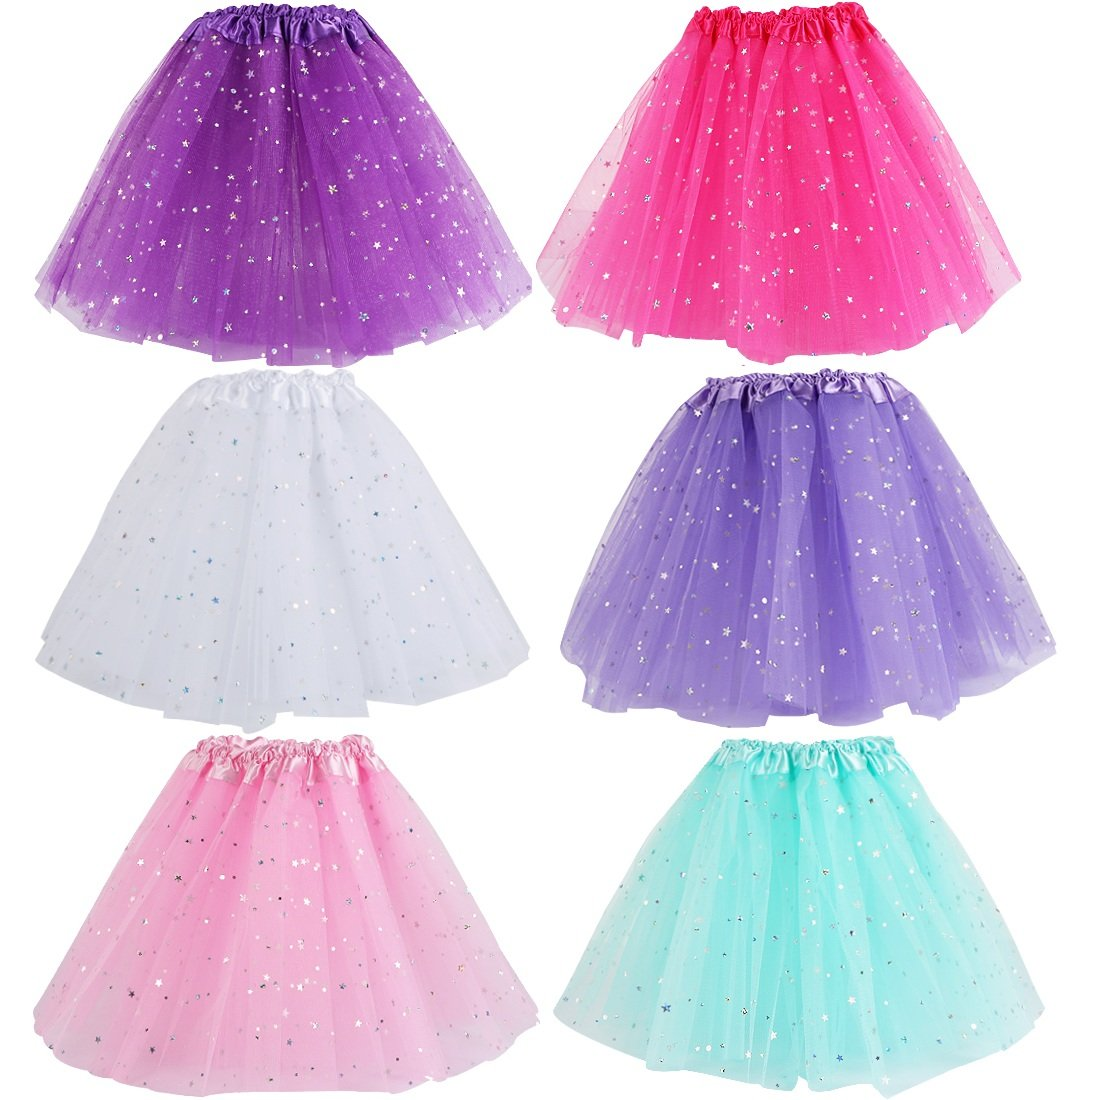 kilofly 6pc Girls Ballet Tutu Kids Birthday Princess Party Favor Dress Skirt Set by kilofly (Image #1)